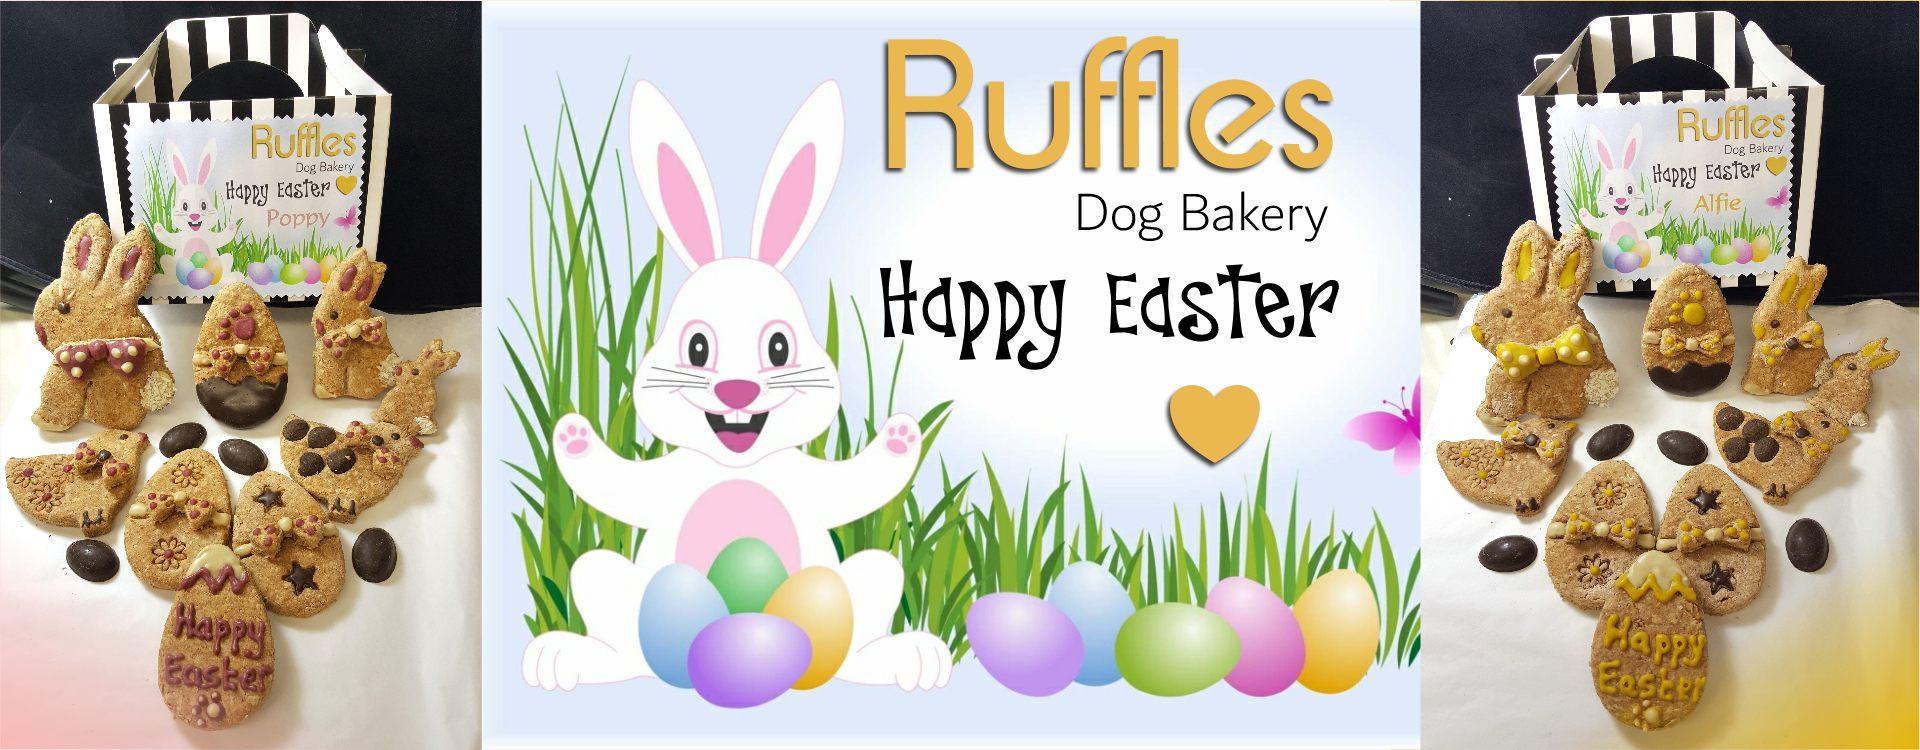 Easter Dog Treat Box Header